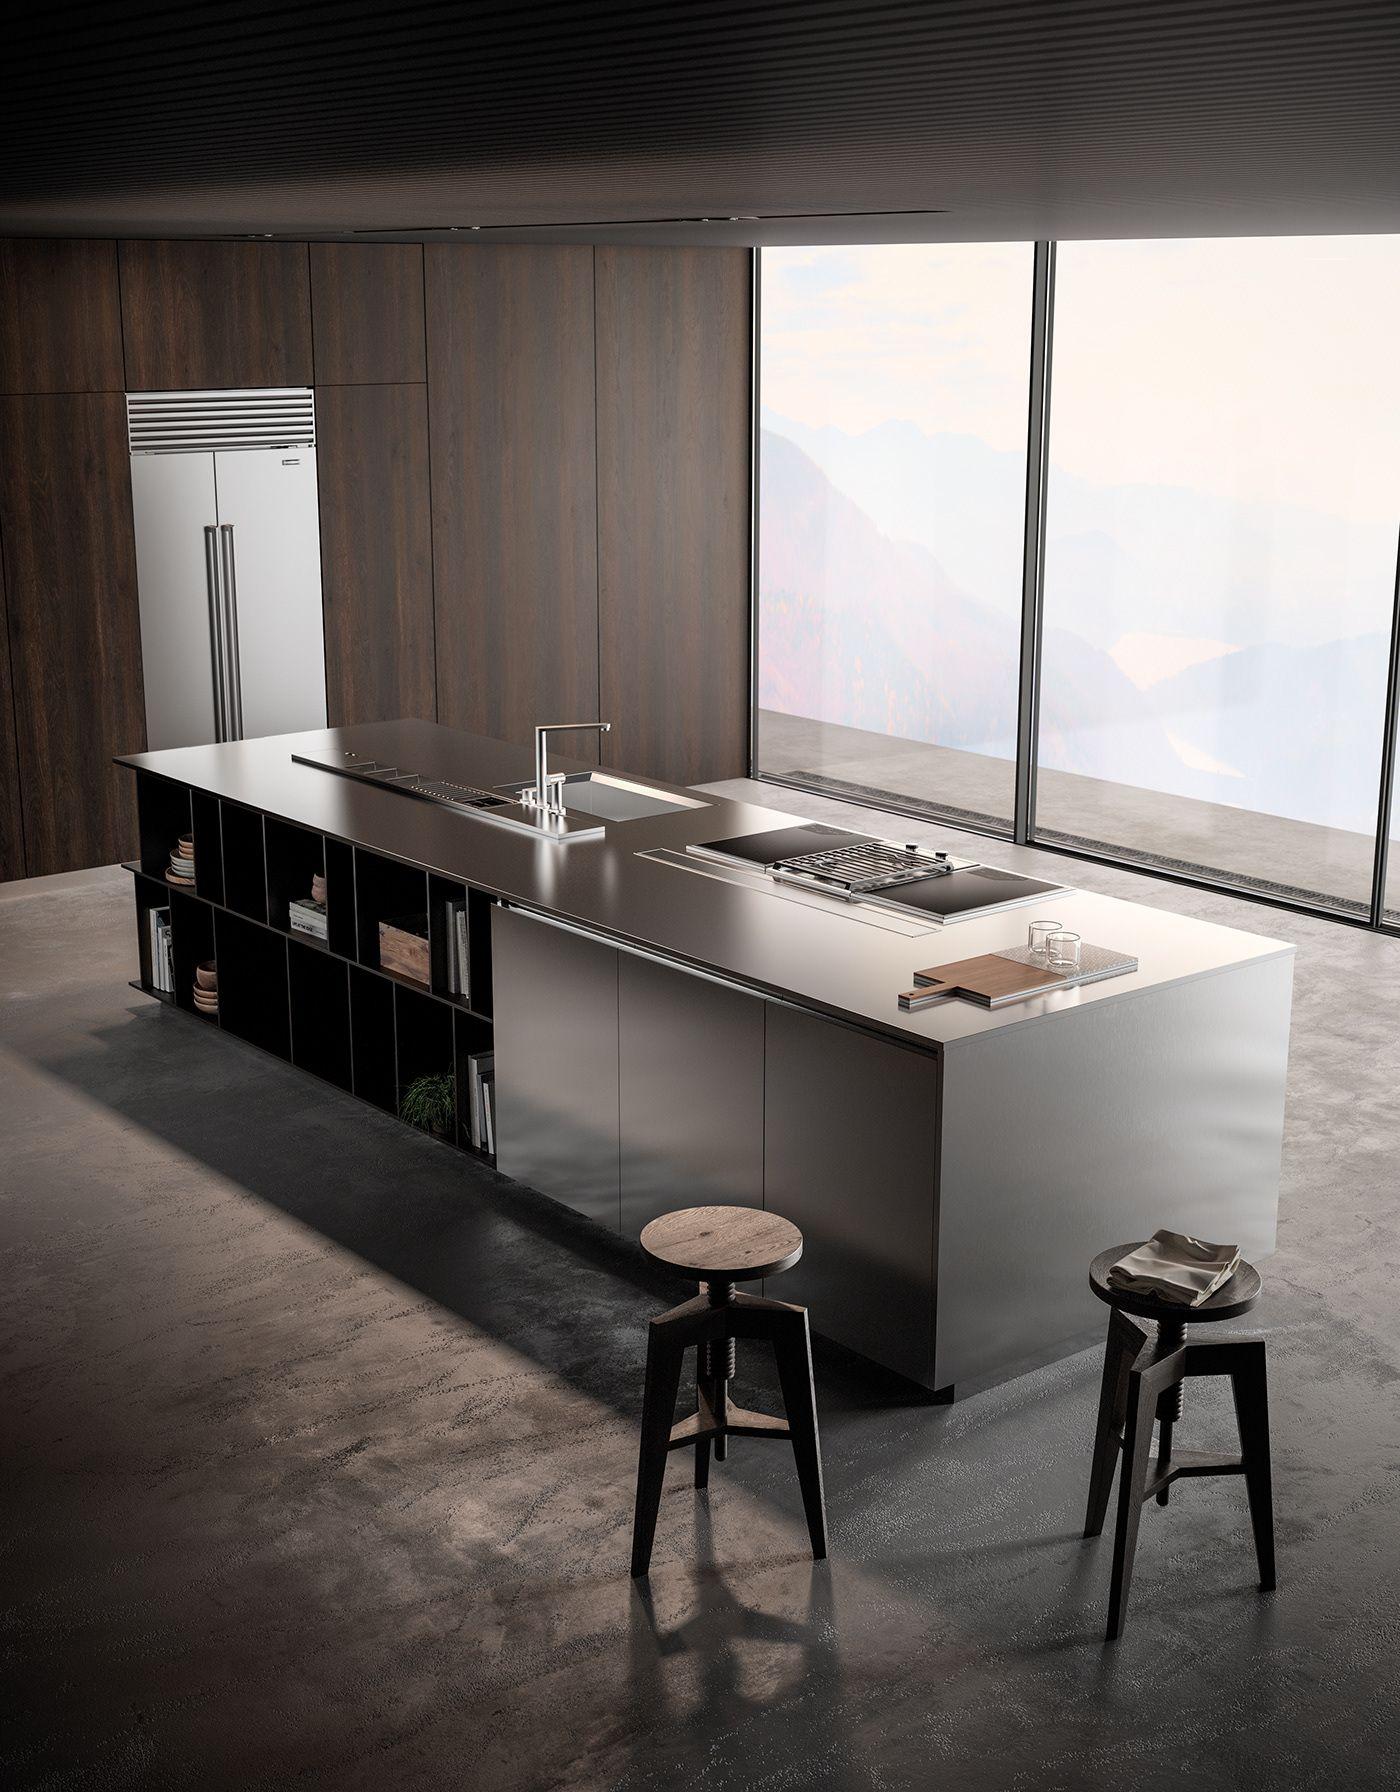 effeti kitchen 2018 on behance kitchen pinterest kitchen rh pinterest com